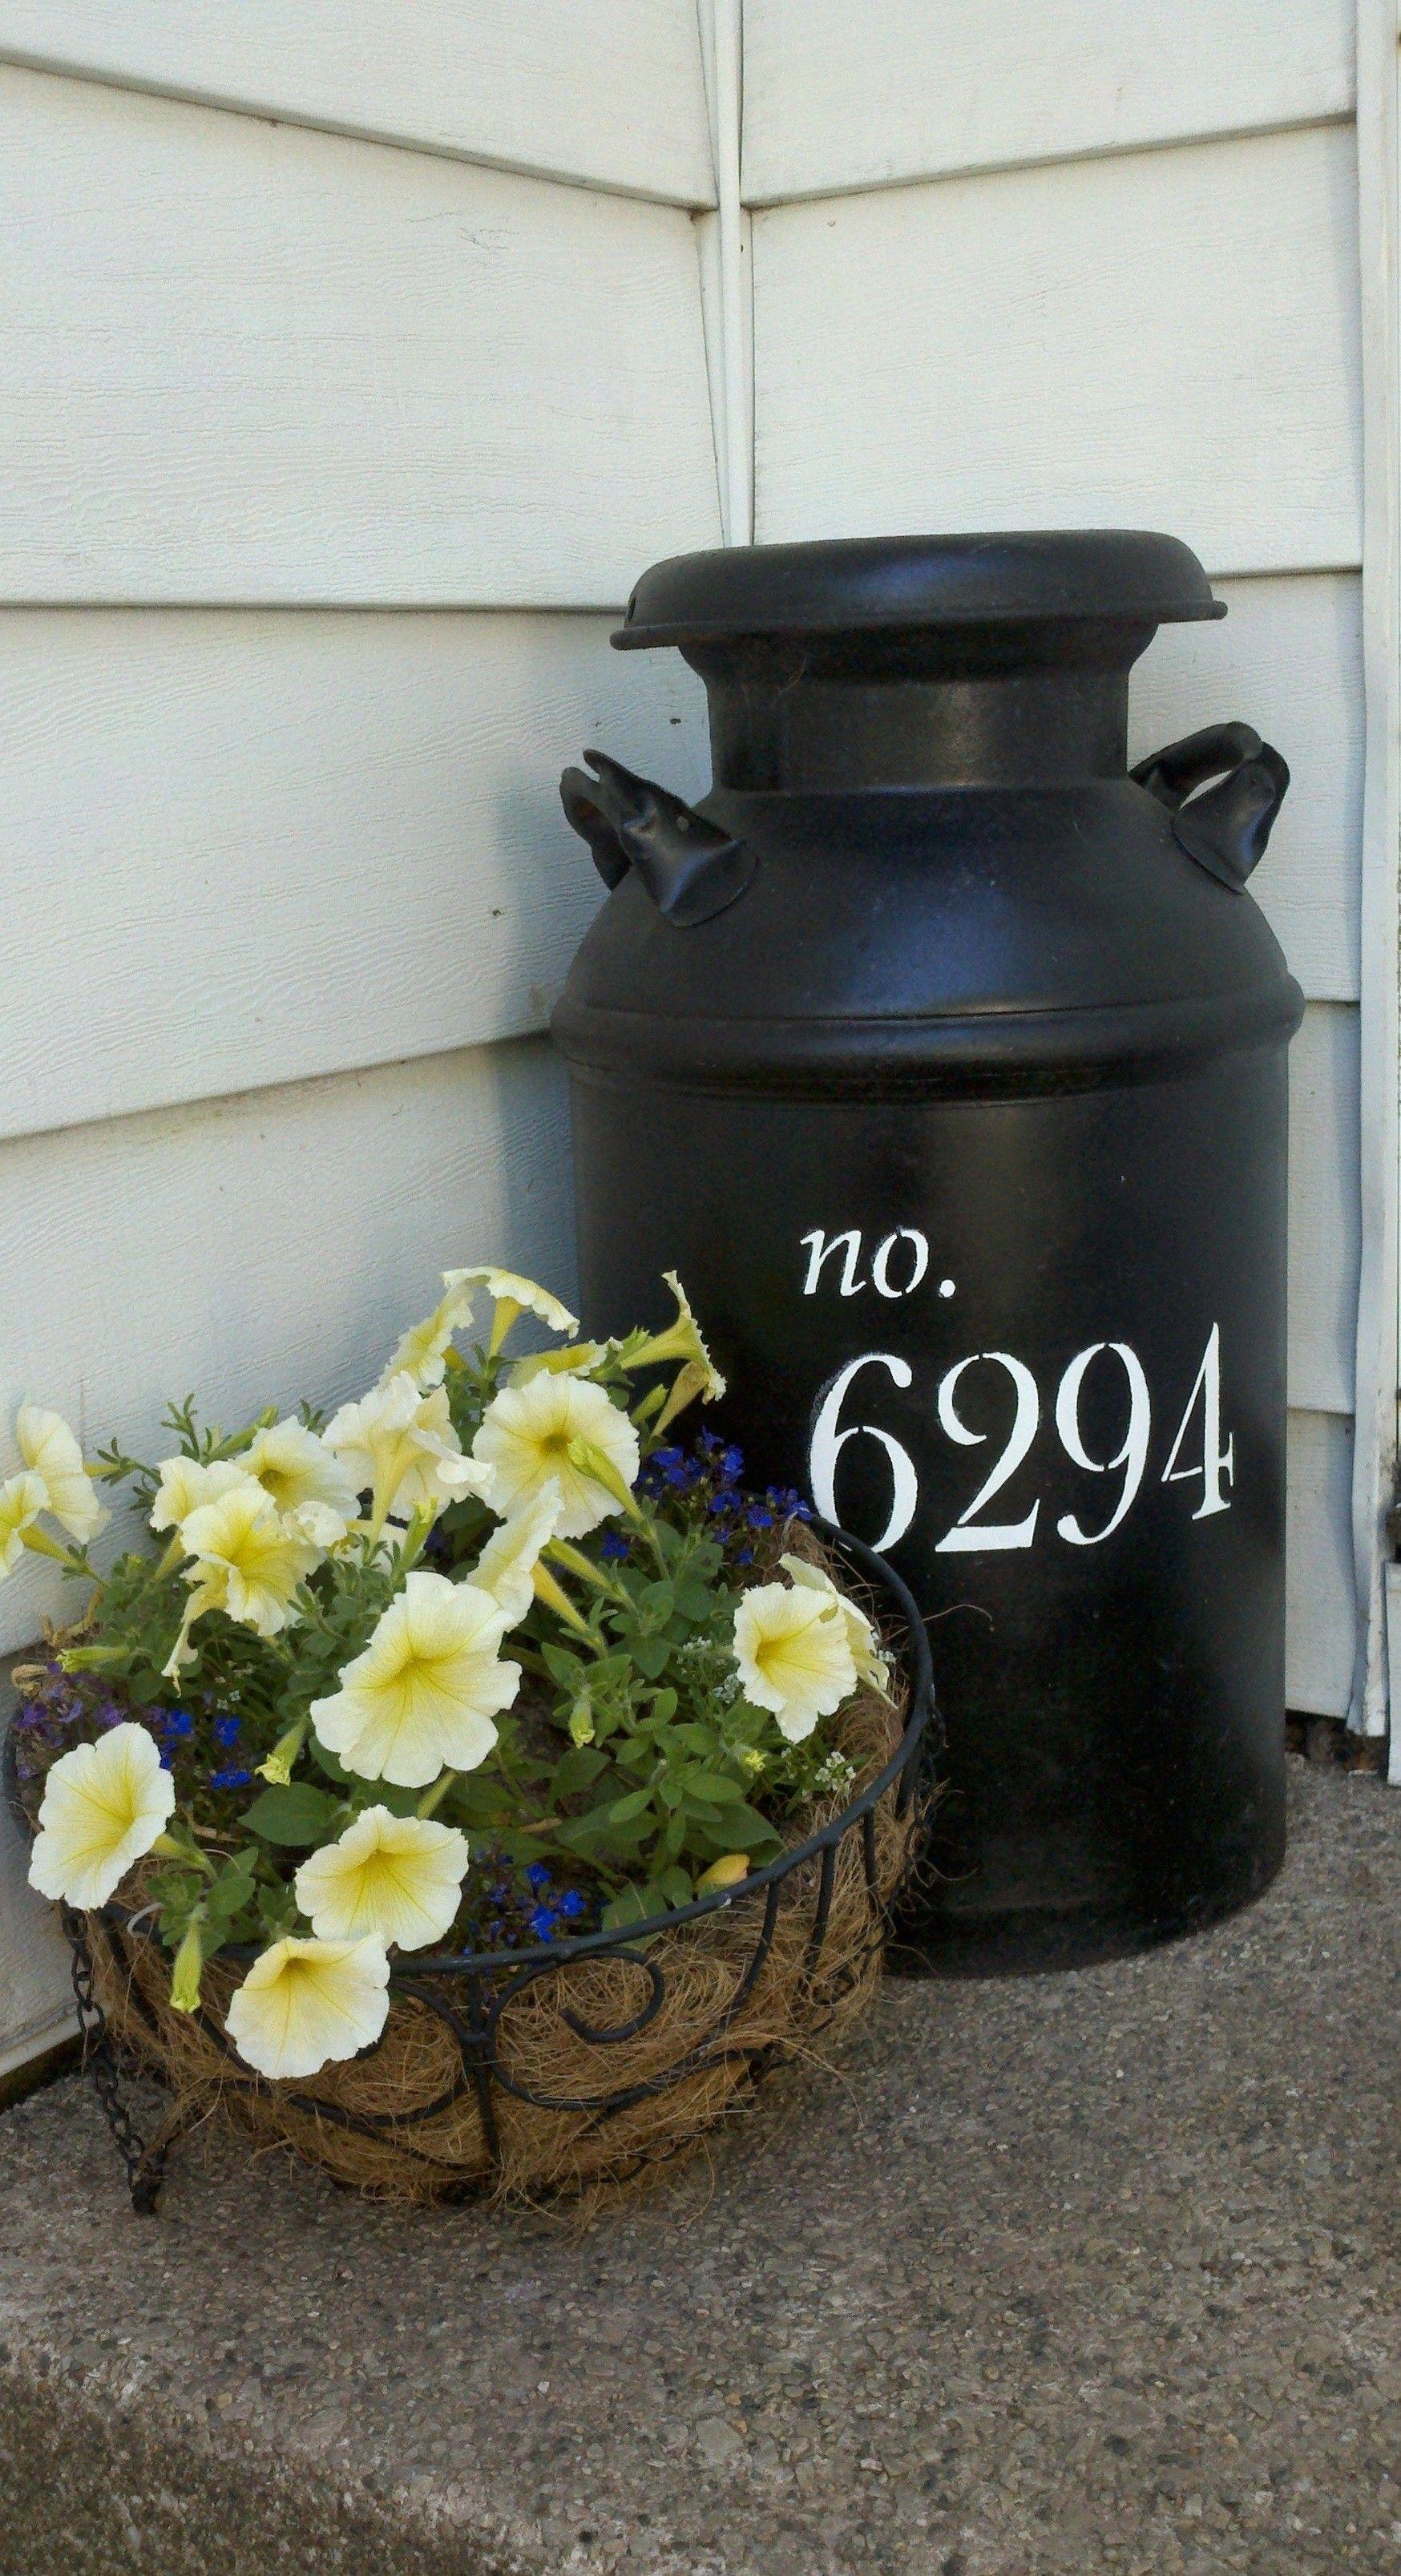 House Number Milk Jug Wish I Had A Good Spot For This Unique House Numbers House Numbers Diy Milk Cans